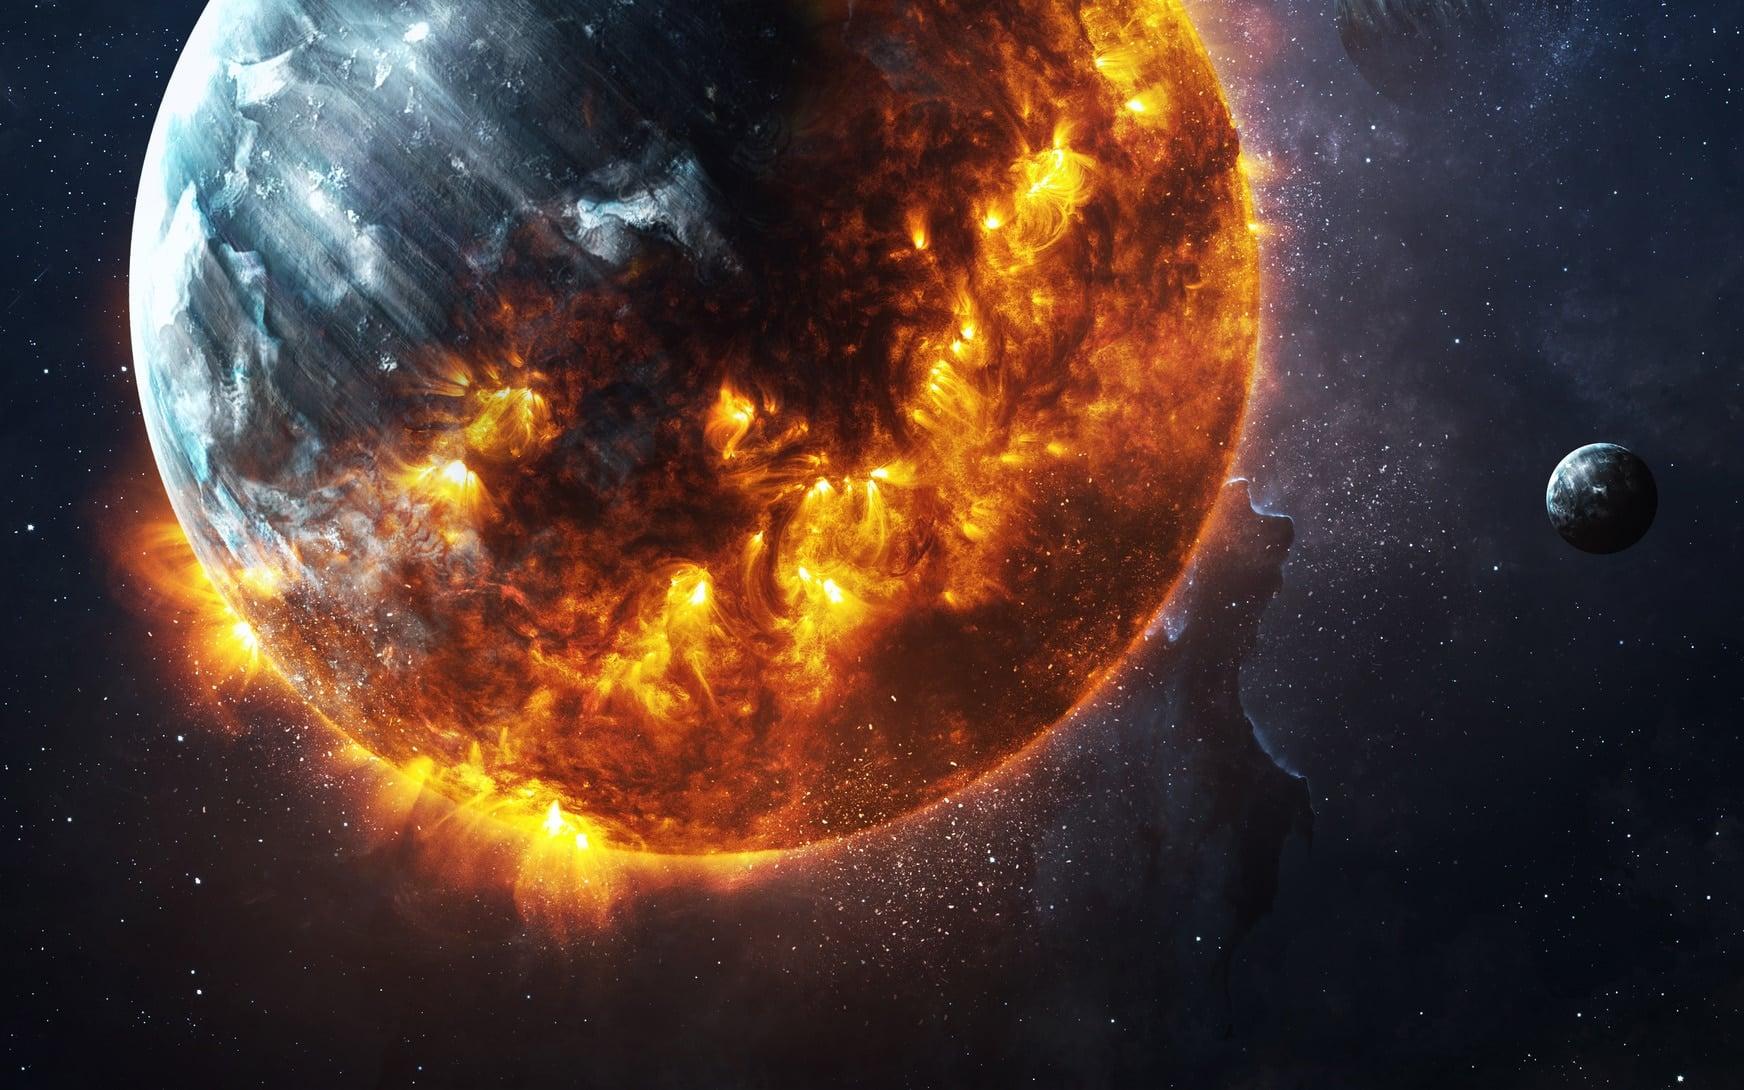 O Apocalipse, um Livro Aberto